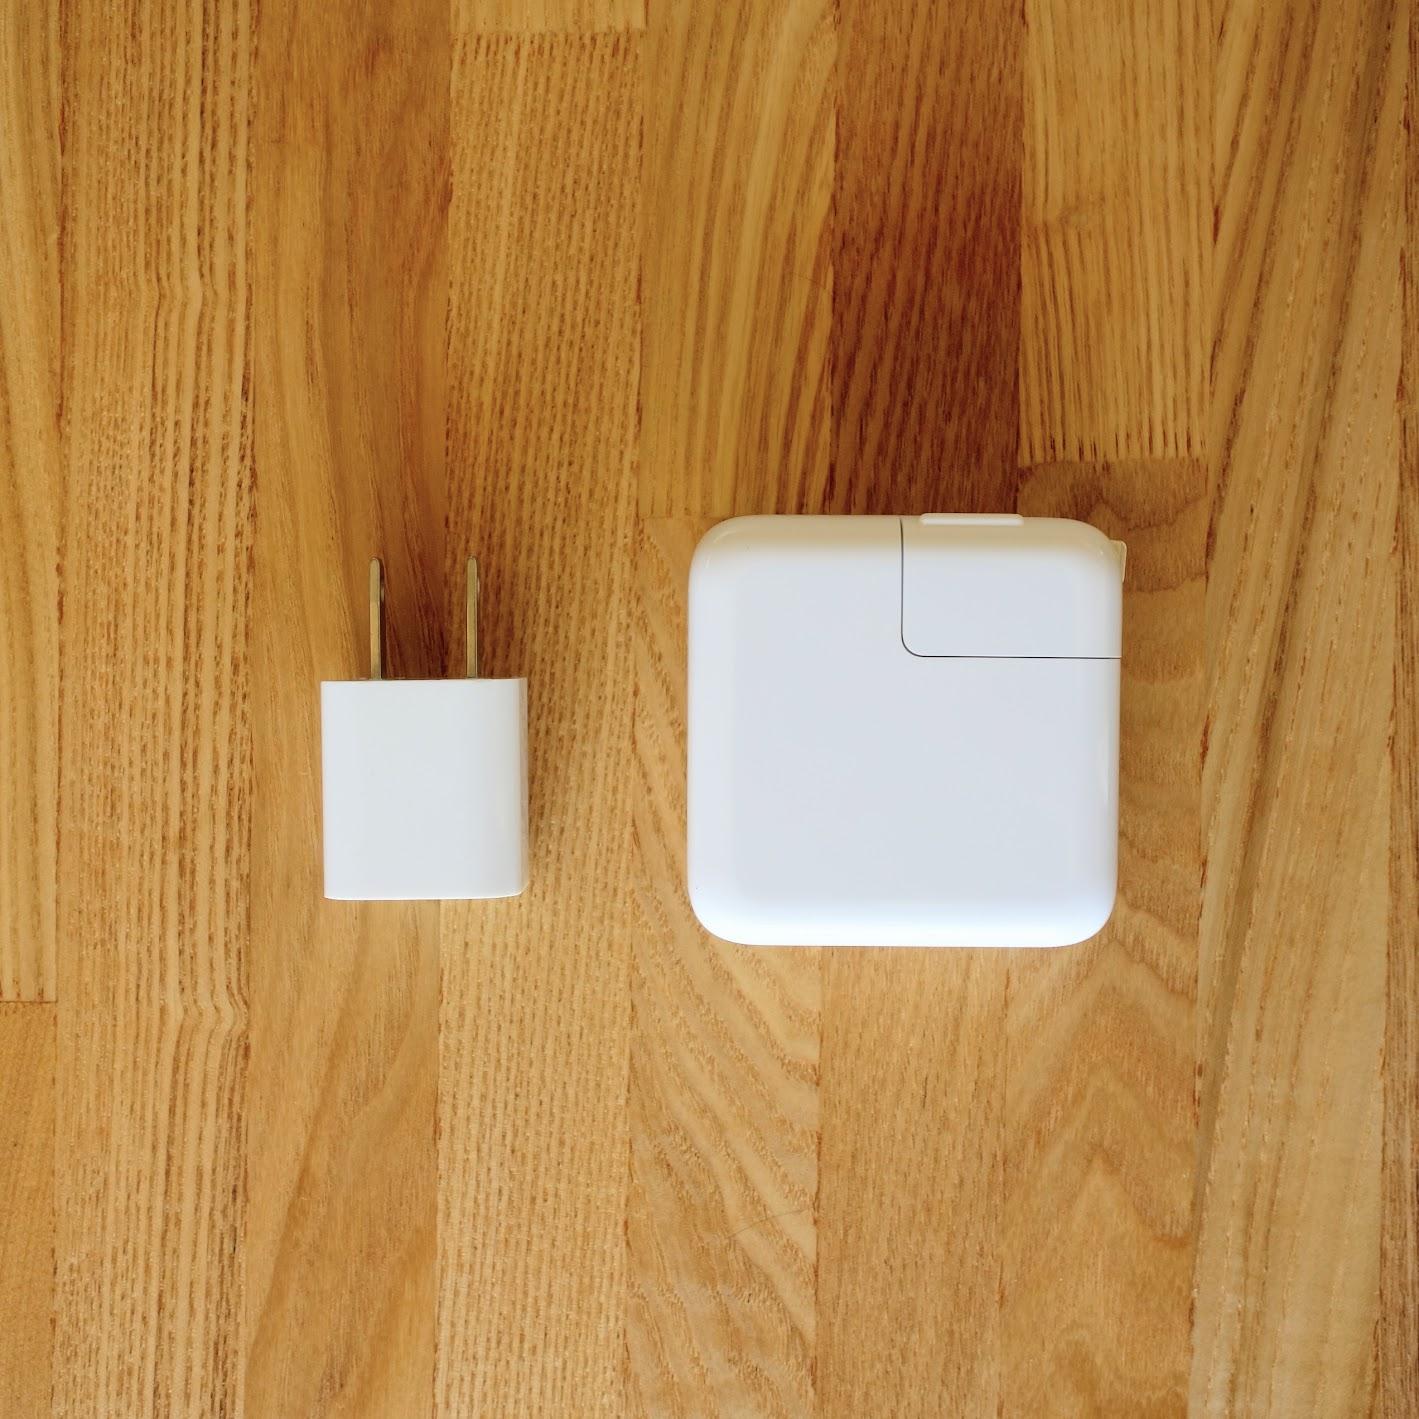 MacBook Airの電源アダプタとiPhoneの電源アダプタ